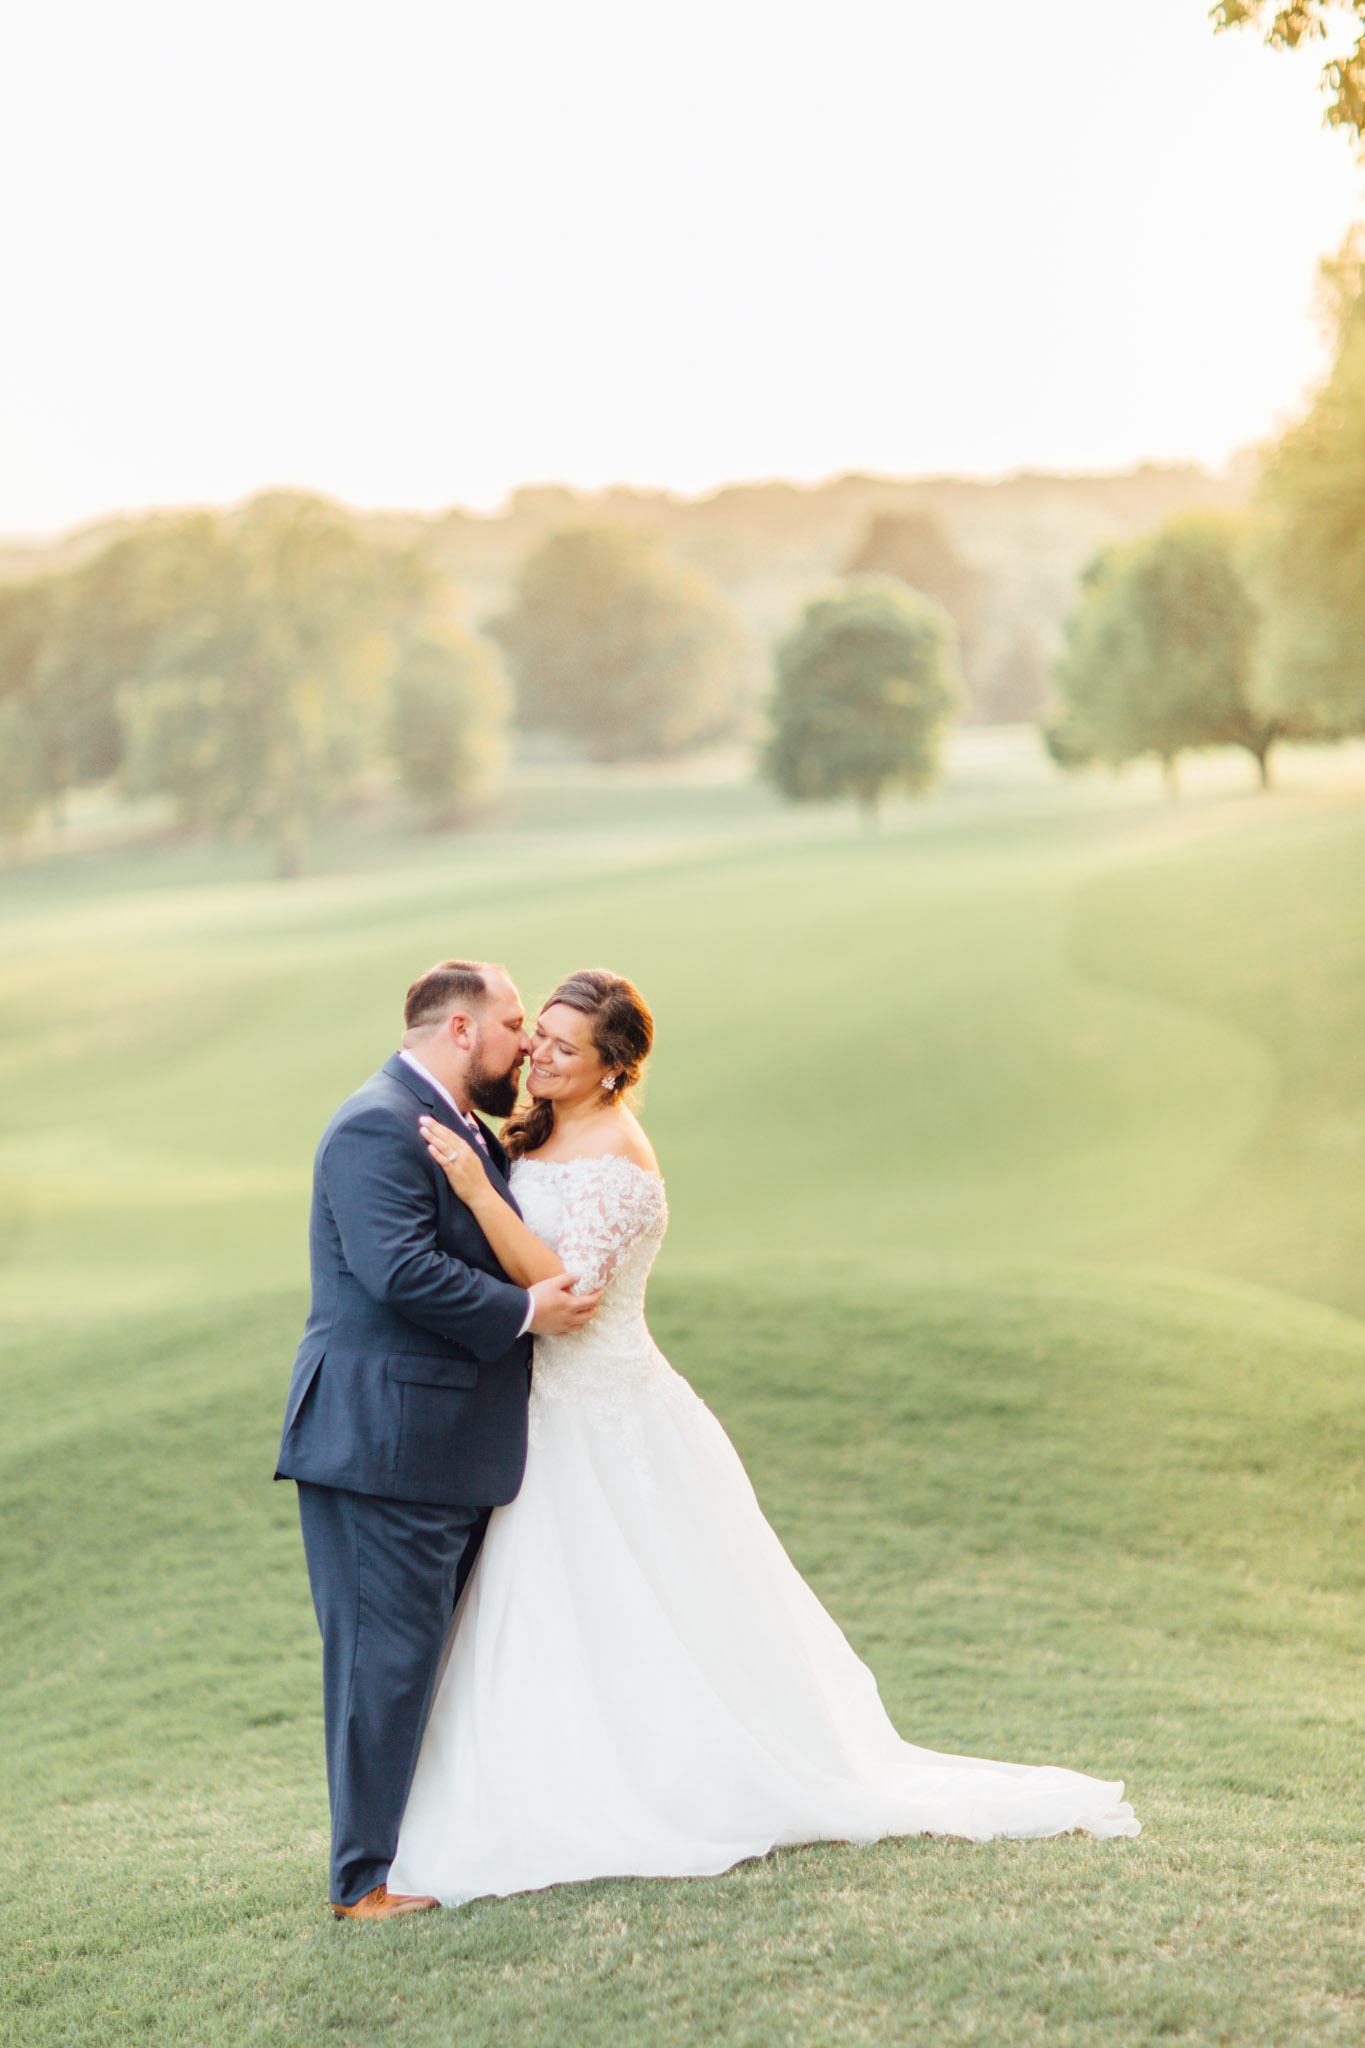 Country Club of Virginia Wedding Photographer_0099.jpg